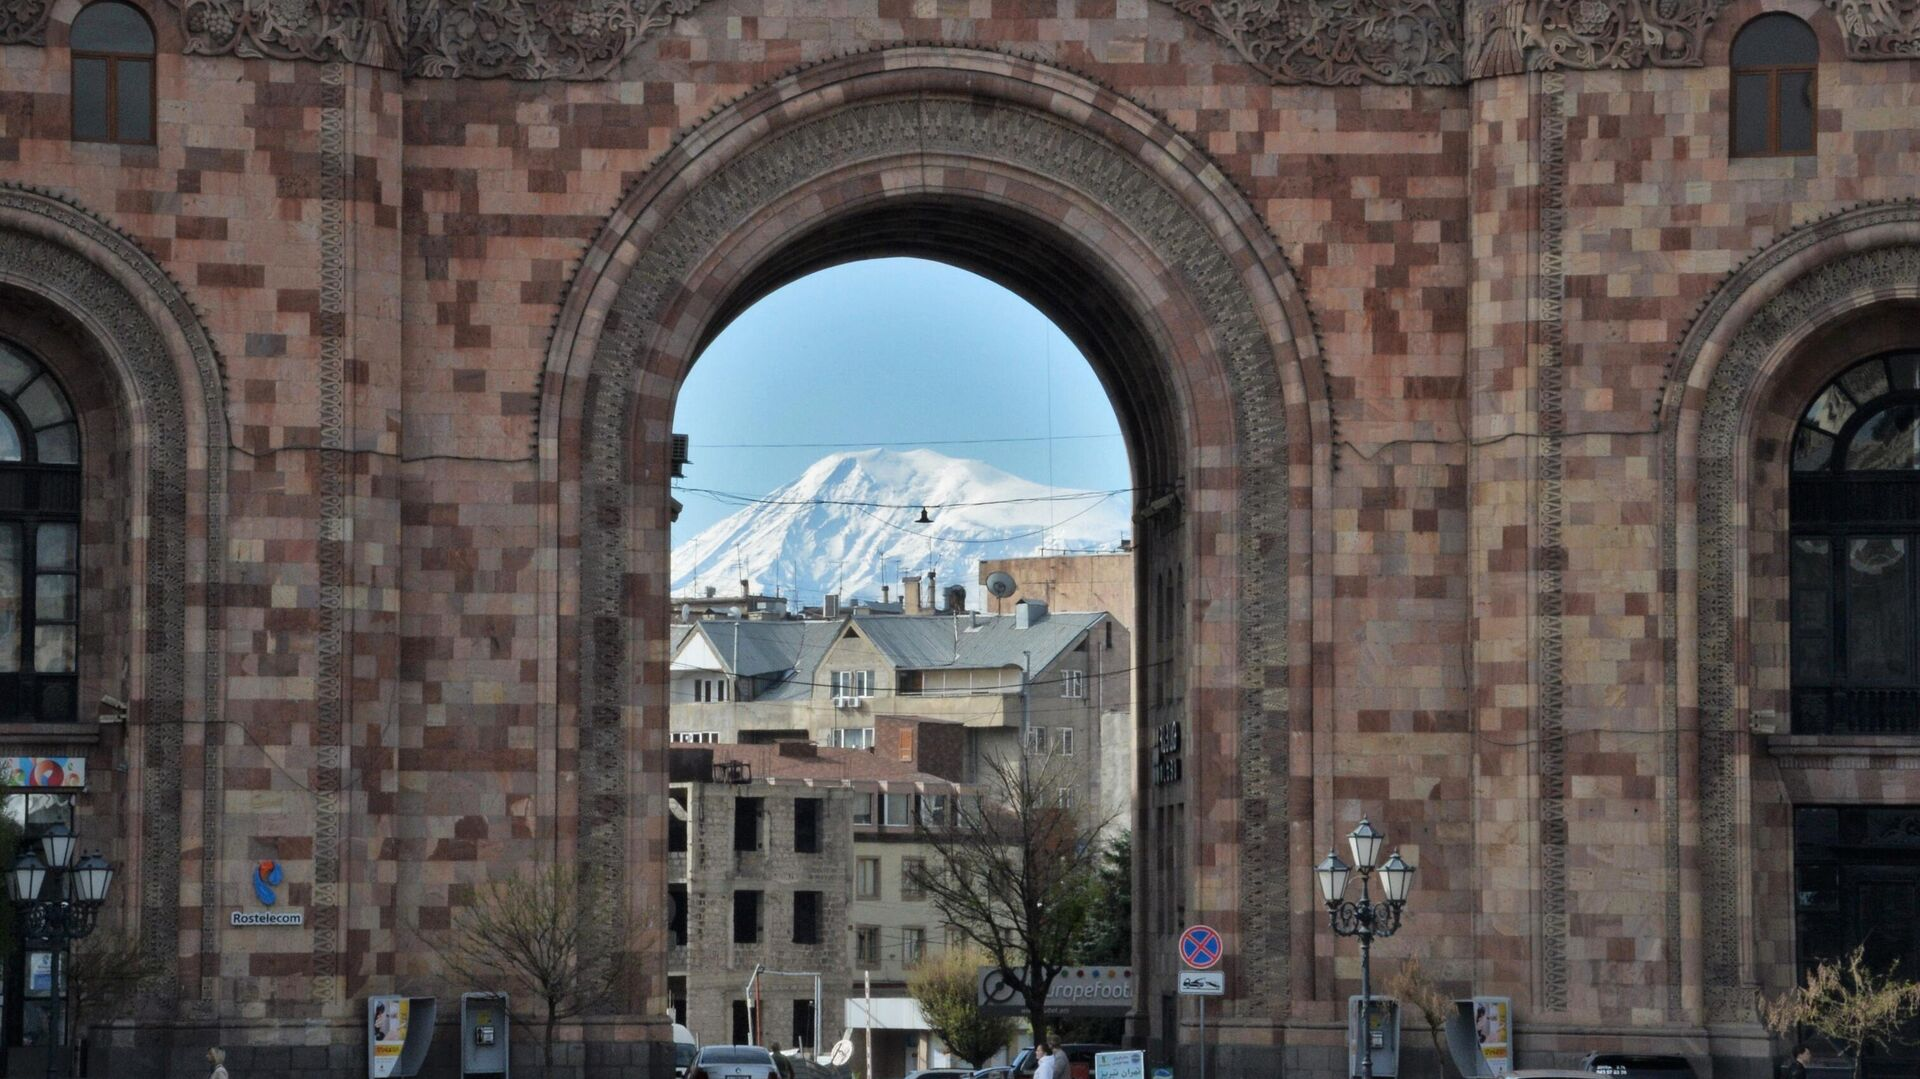 Гора Арарат со стороны Армении  - РИА Новости, 1920, 19.11.2020